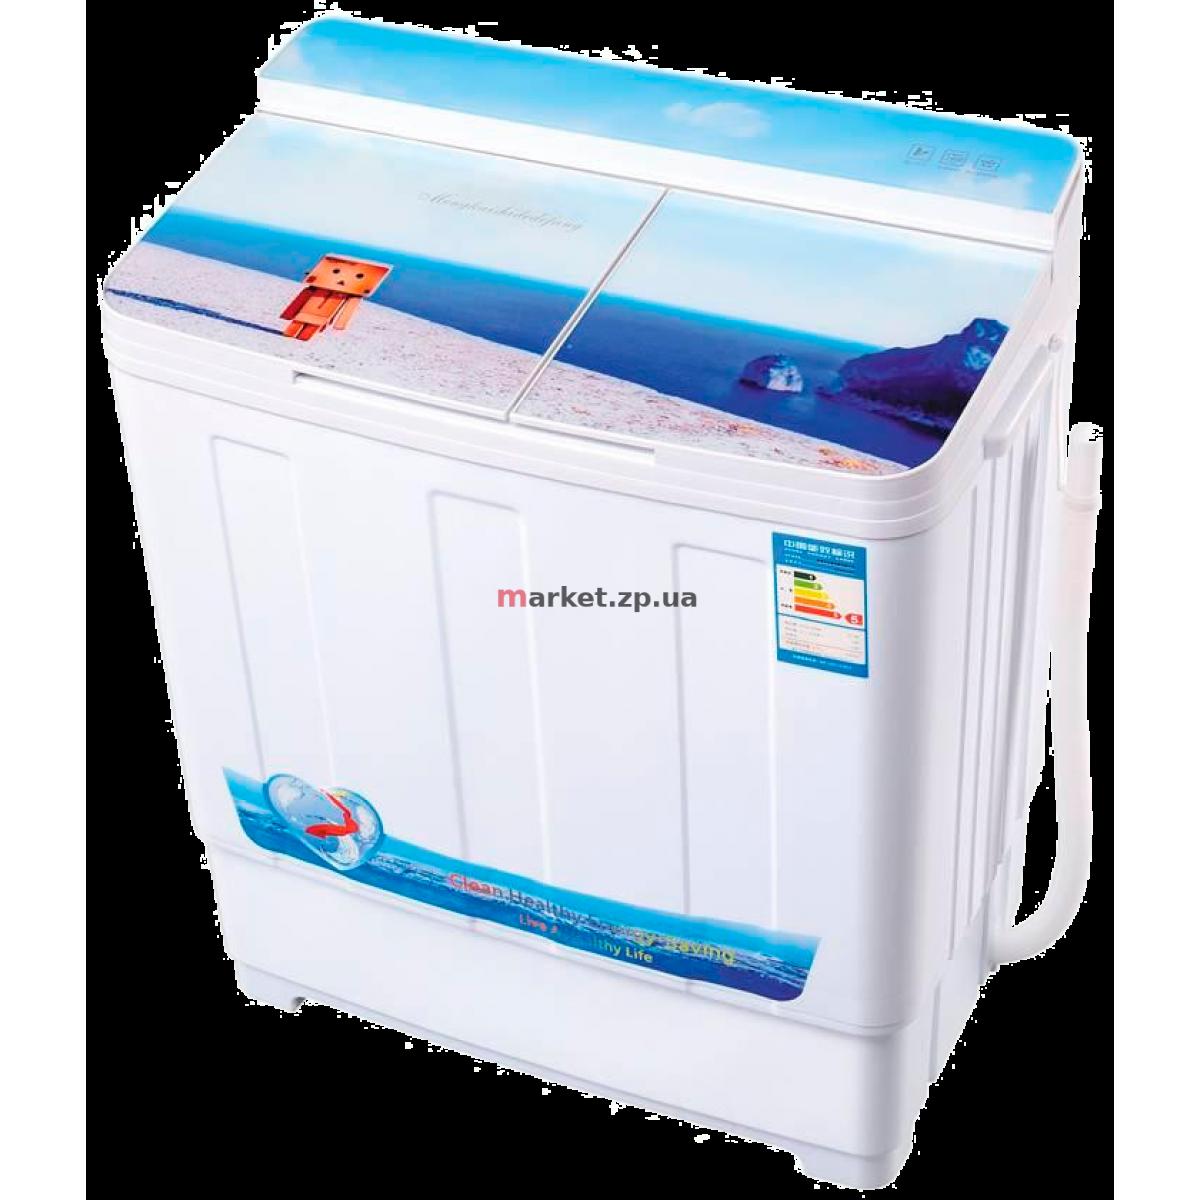 Стиральная машина полуавтомат PRIME Technics PWA 652 GB